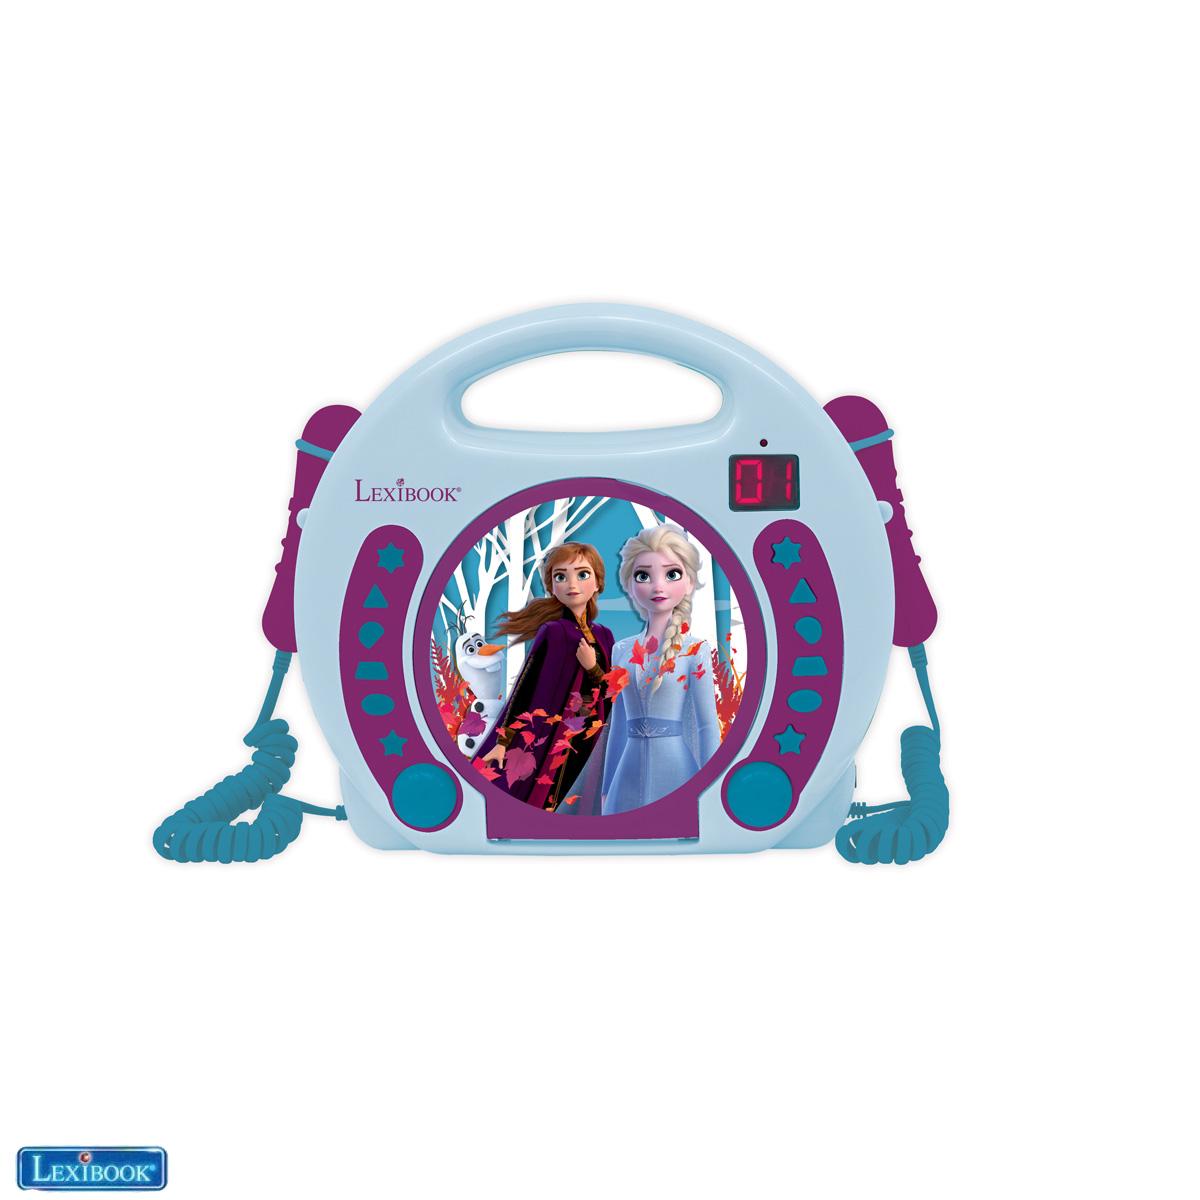 Lexibook - Frozen Portable CD player with 2 Sing Along microphones (RCDK100FZ)